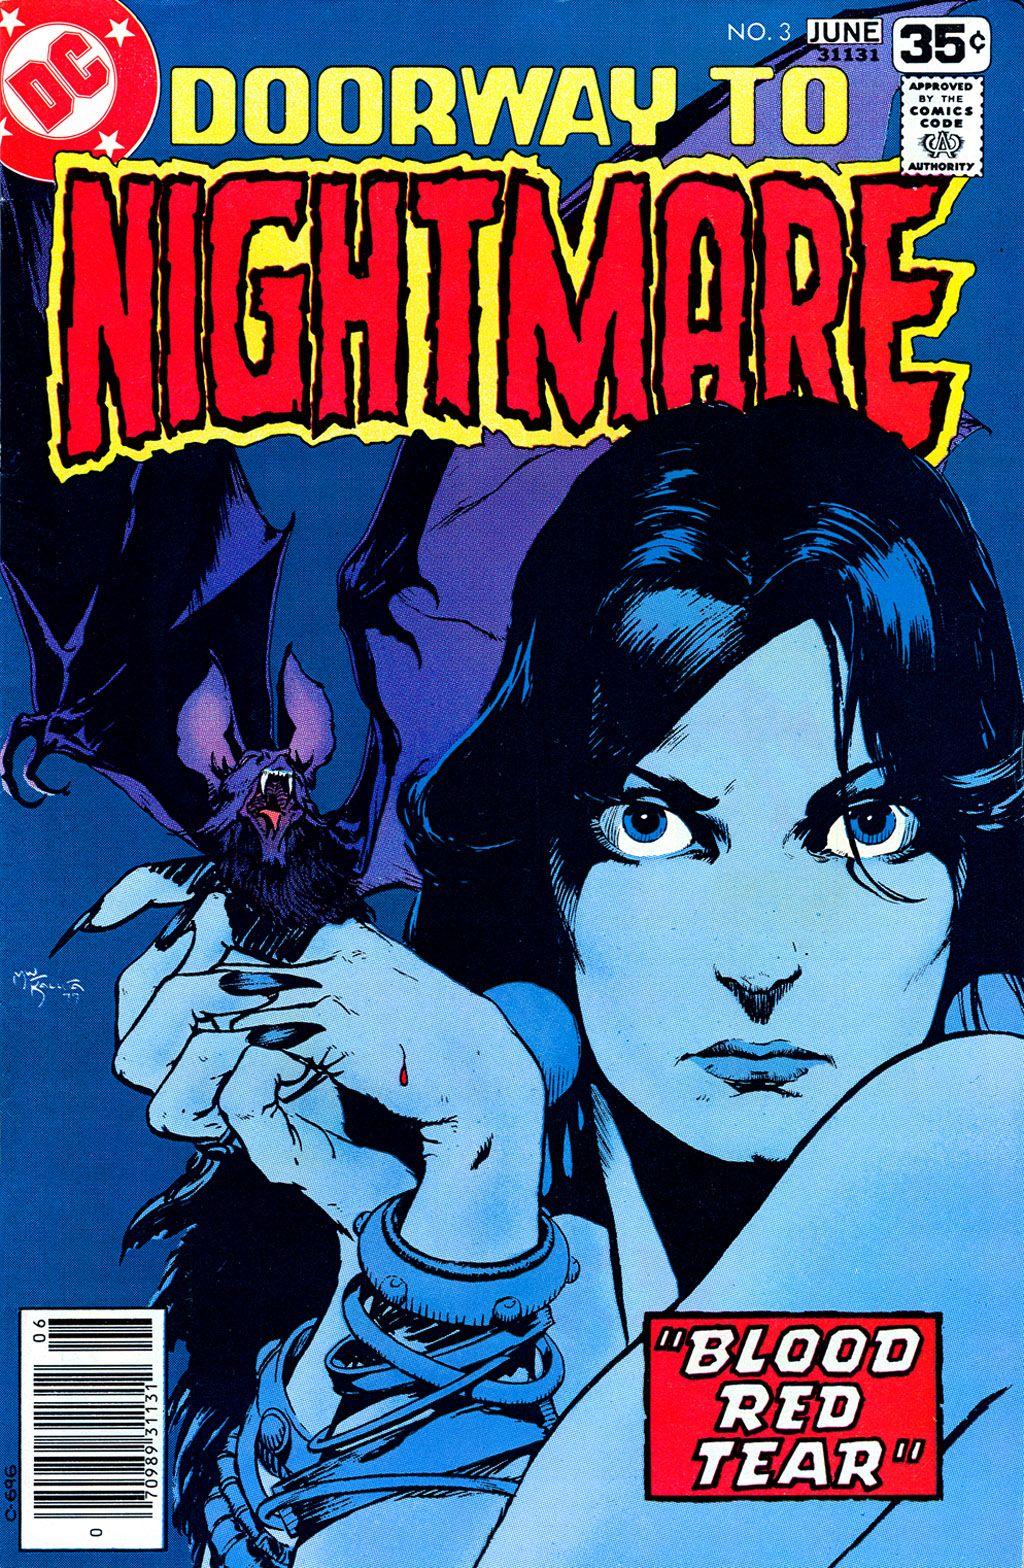 Comic Book Covers Photo Comic book covers, Horror